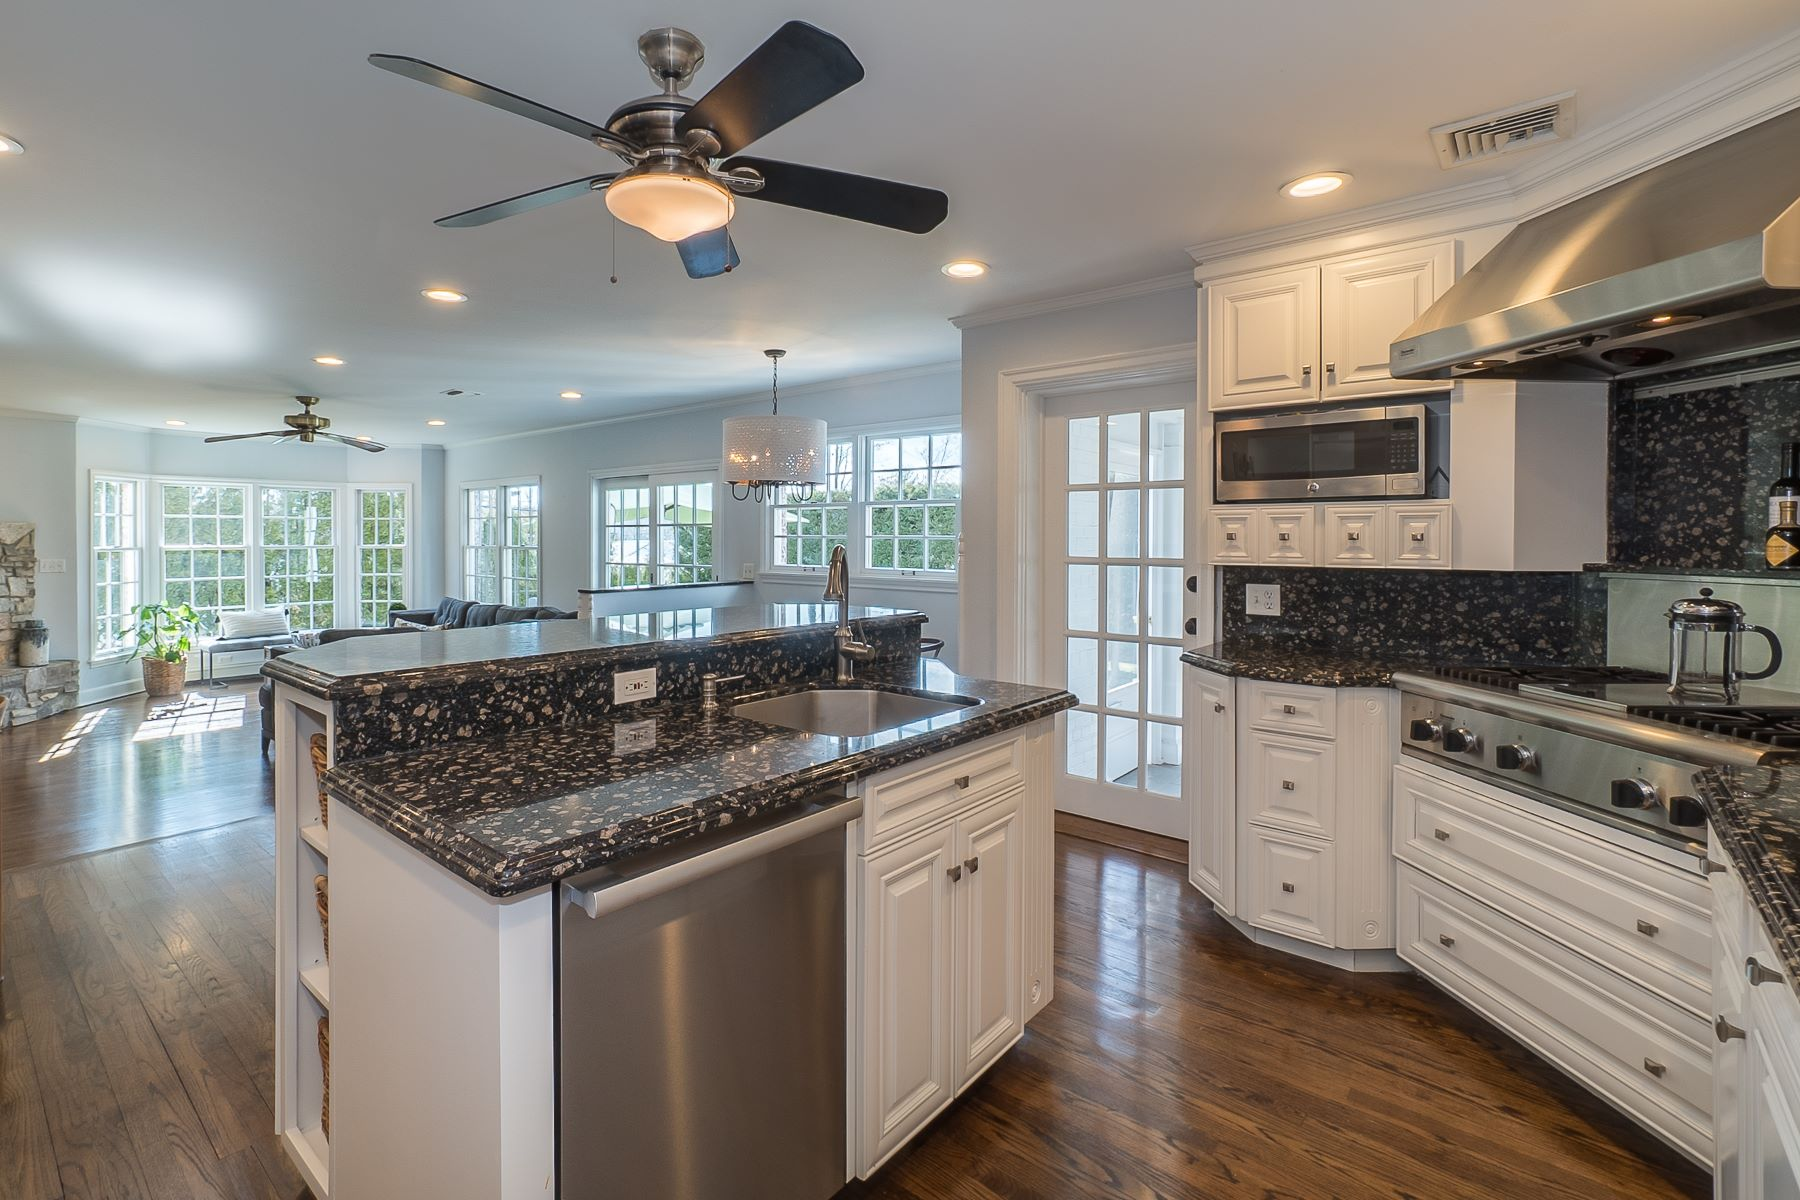 Single Family Homes for Sale at Manhasset 12 Willets Lane Manhasset, New York 11030 United States